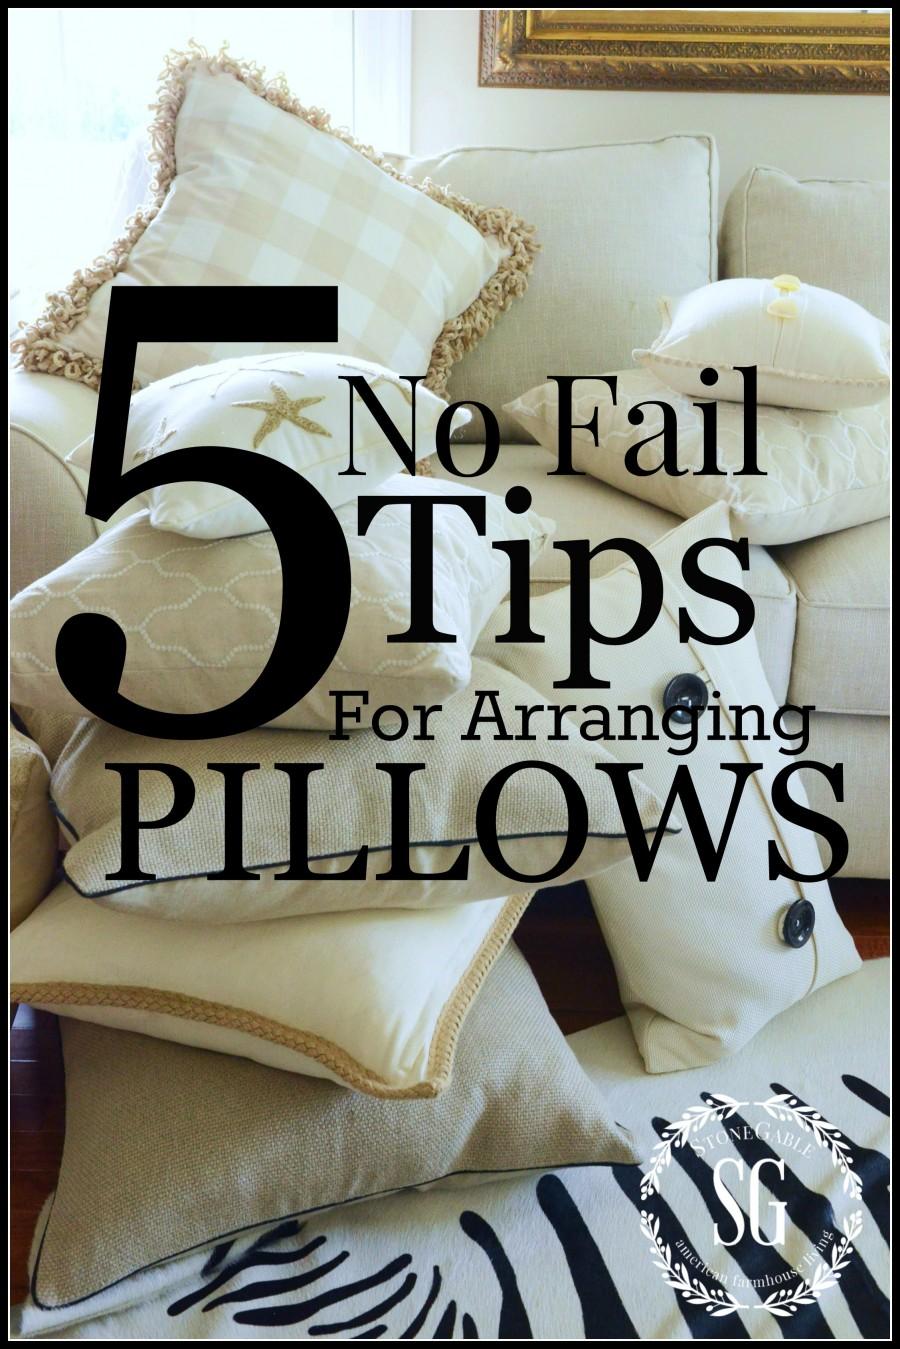 Copy of sofa pillows-TITLE PAGEt-stonegableblog.com